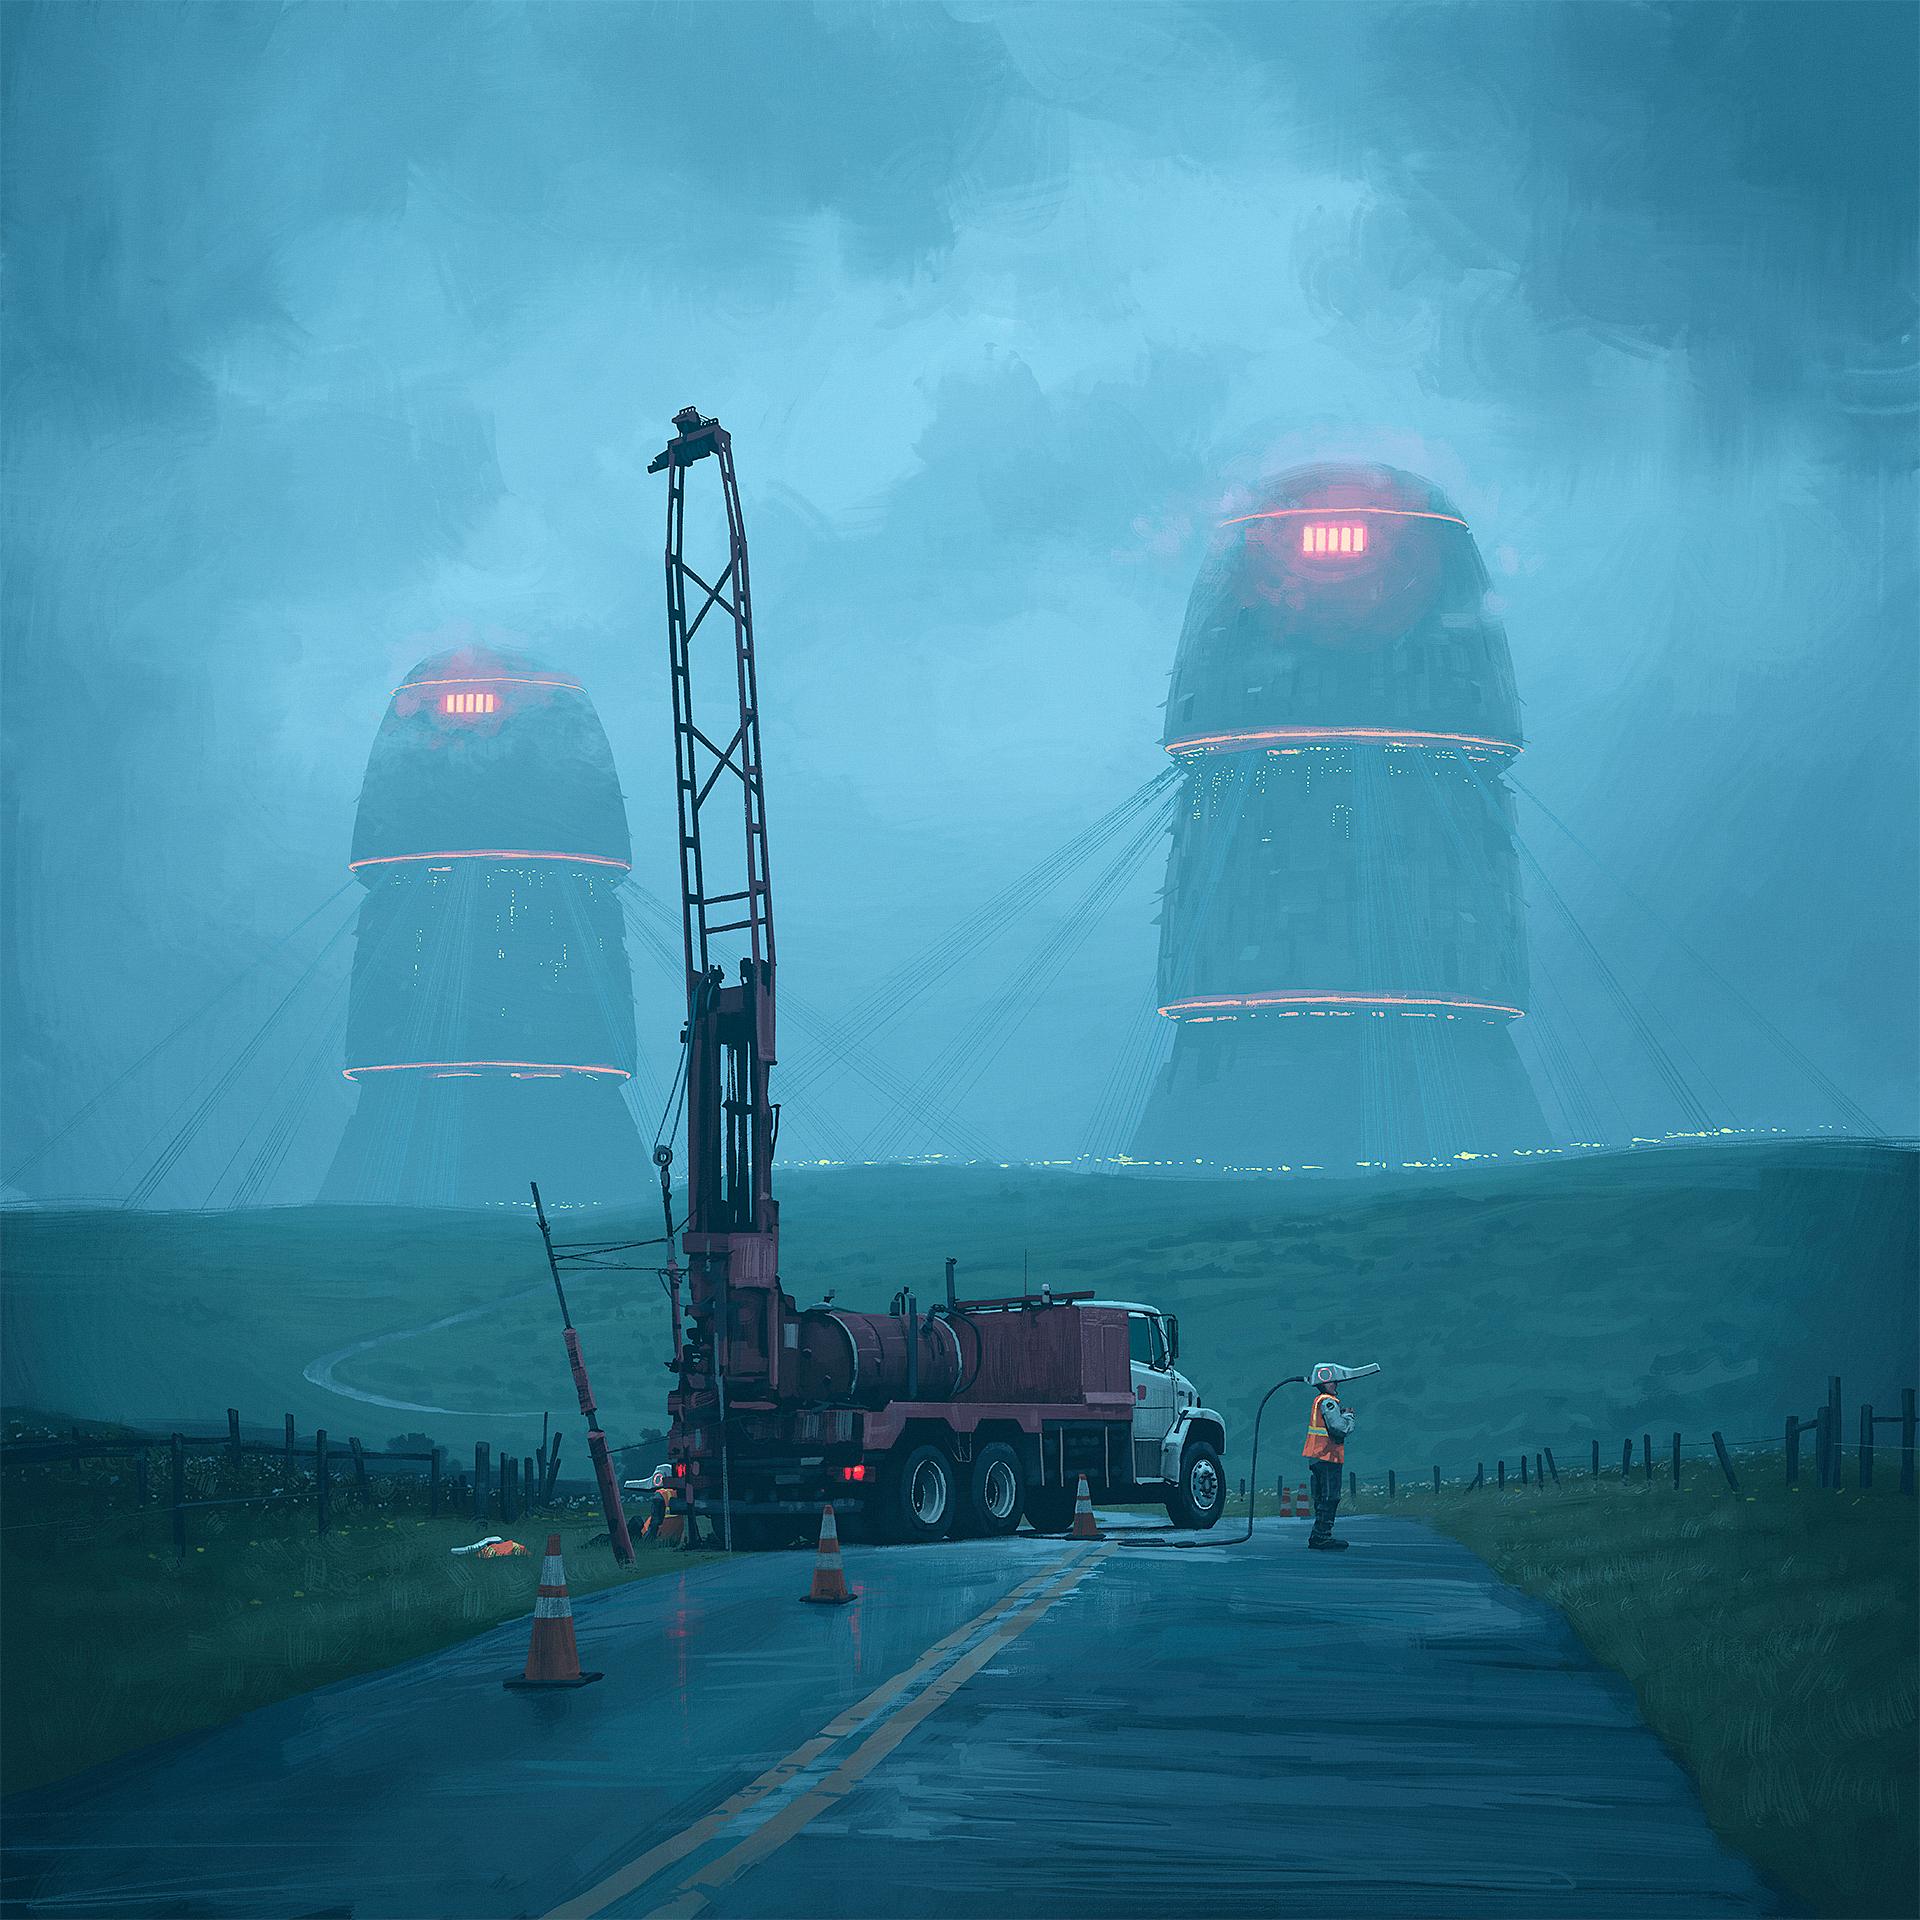 Simon Stalenhag - By Roadwork